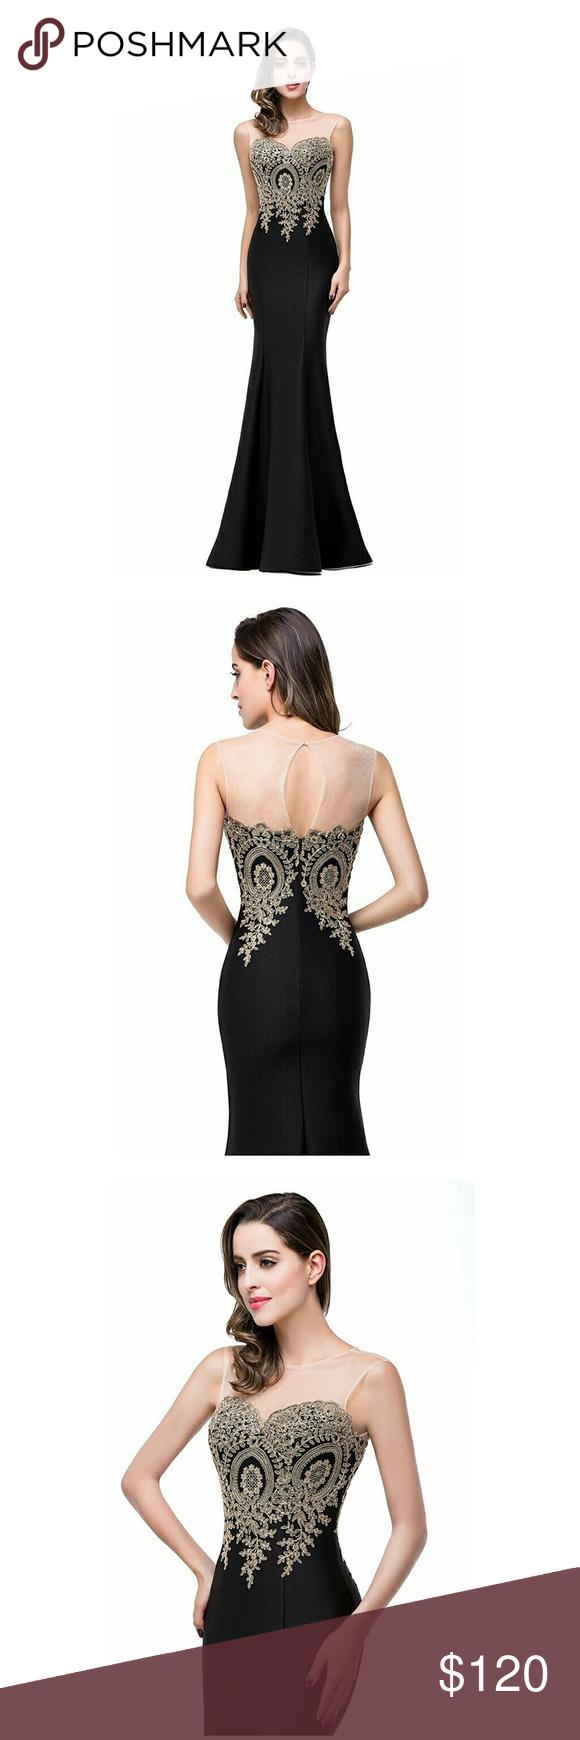 Womenus mermaid evening dresses lace mermaid evening dresses